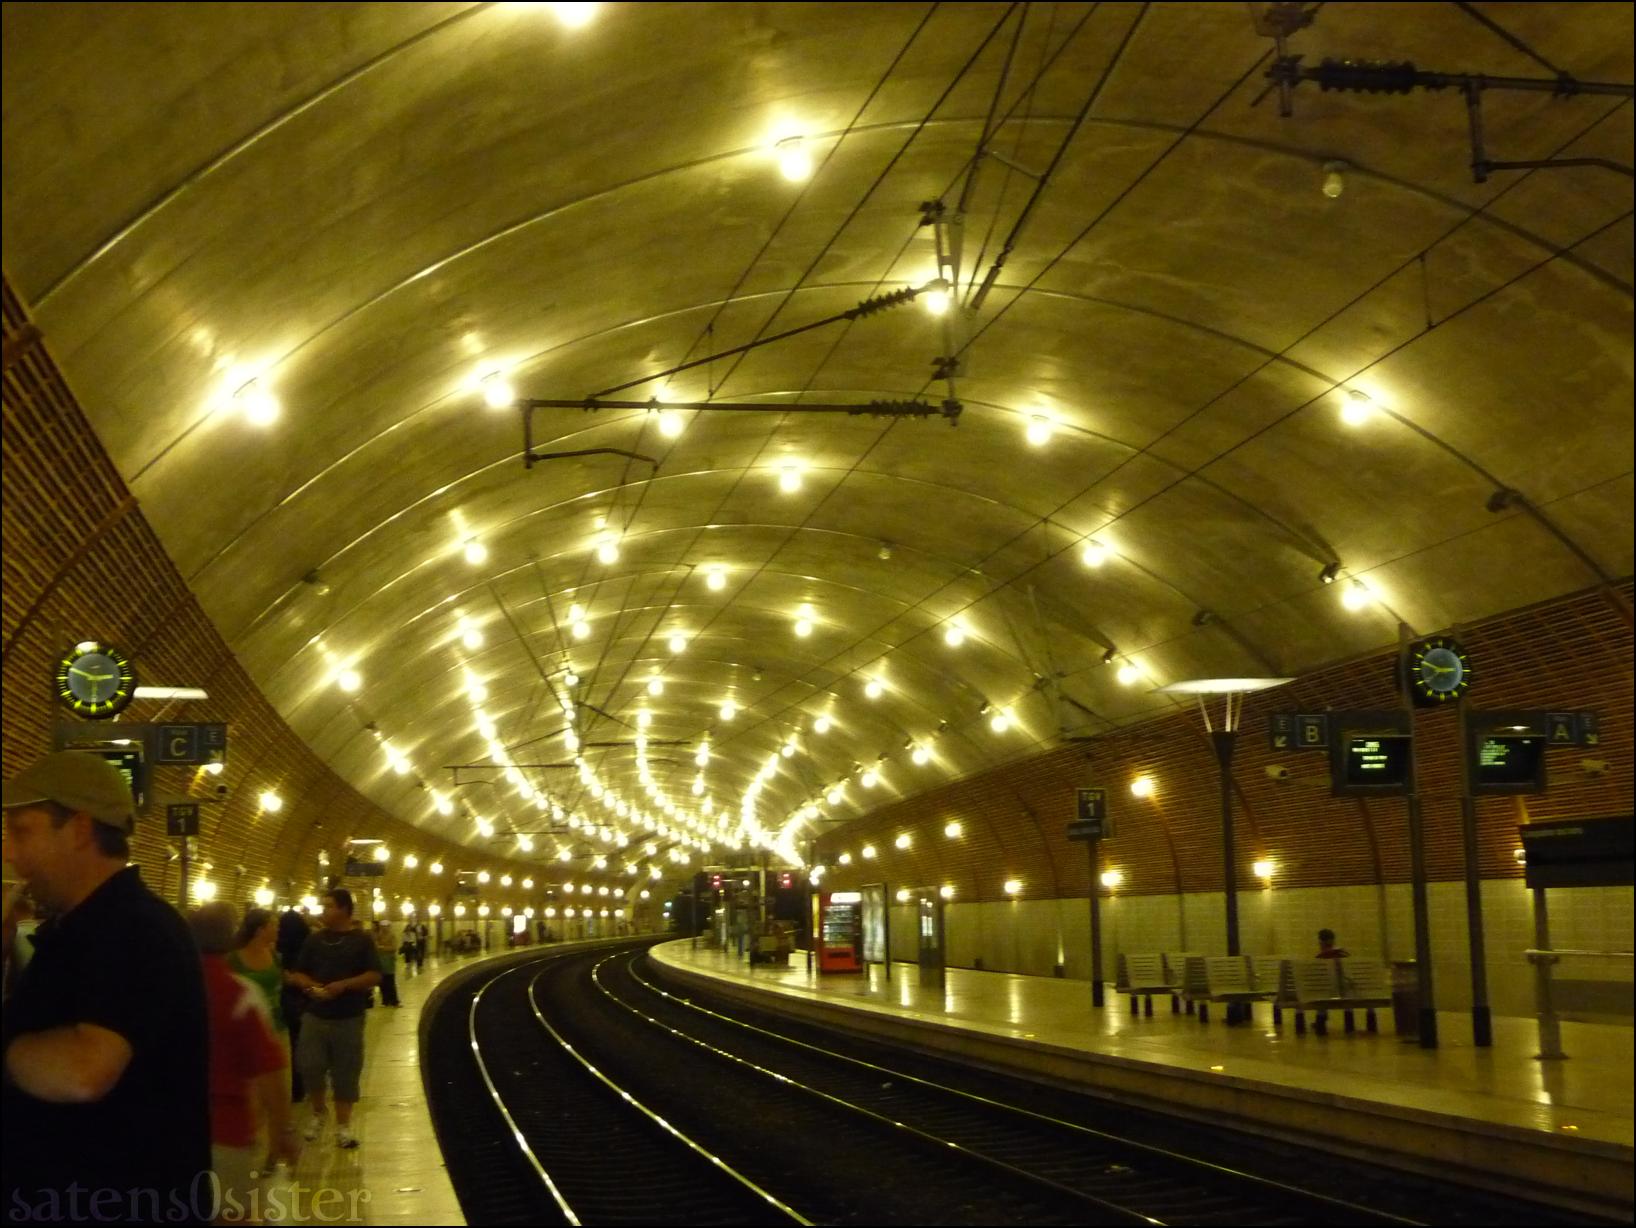 Monaco Underground by Satens0sister on DeviantArt